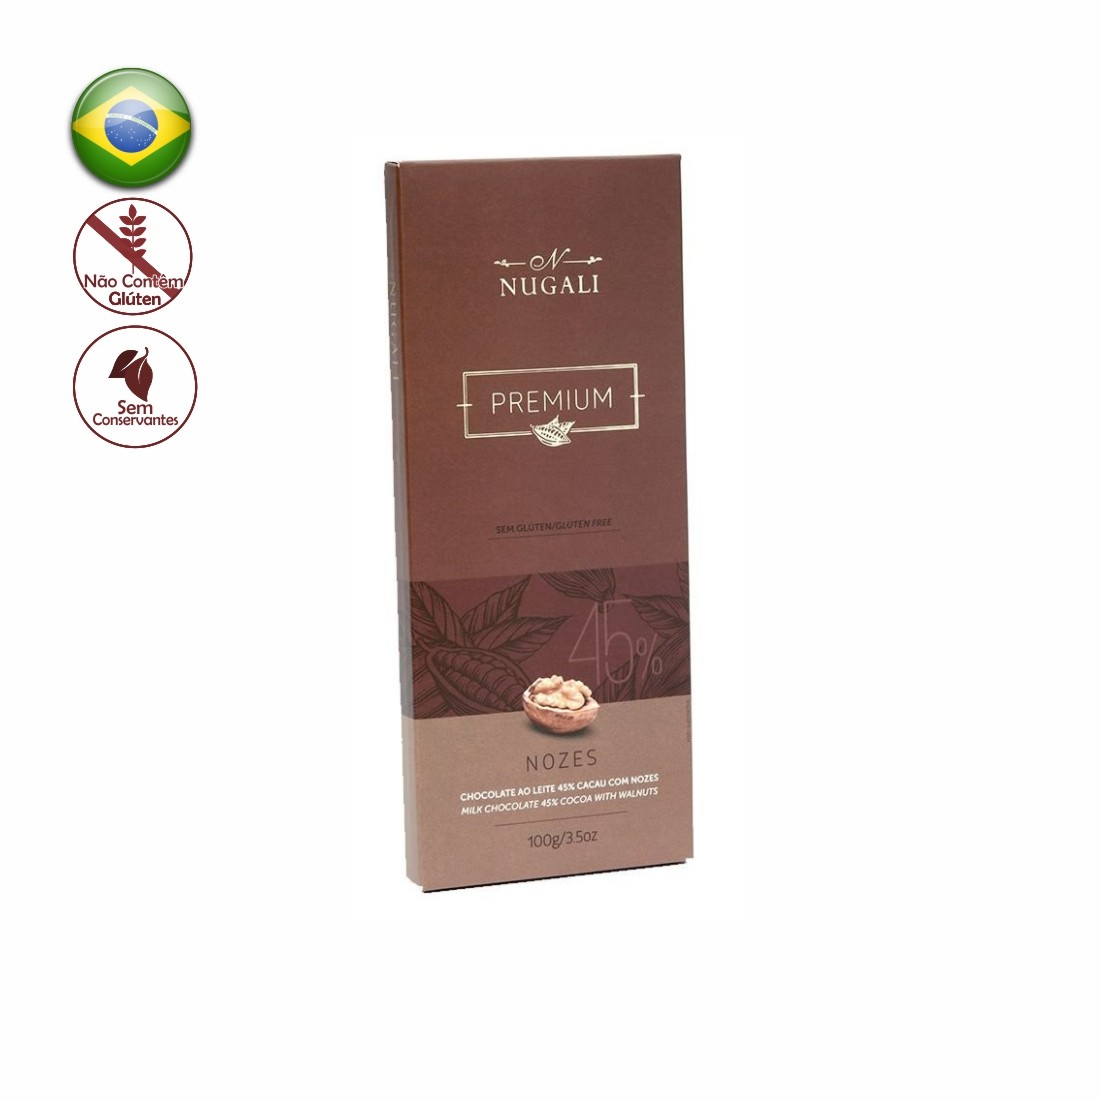 TABLETE NUGALI CHOCOLATE AO LEITE C/ NOZES 100G